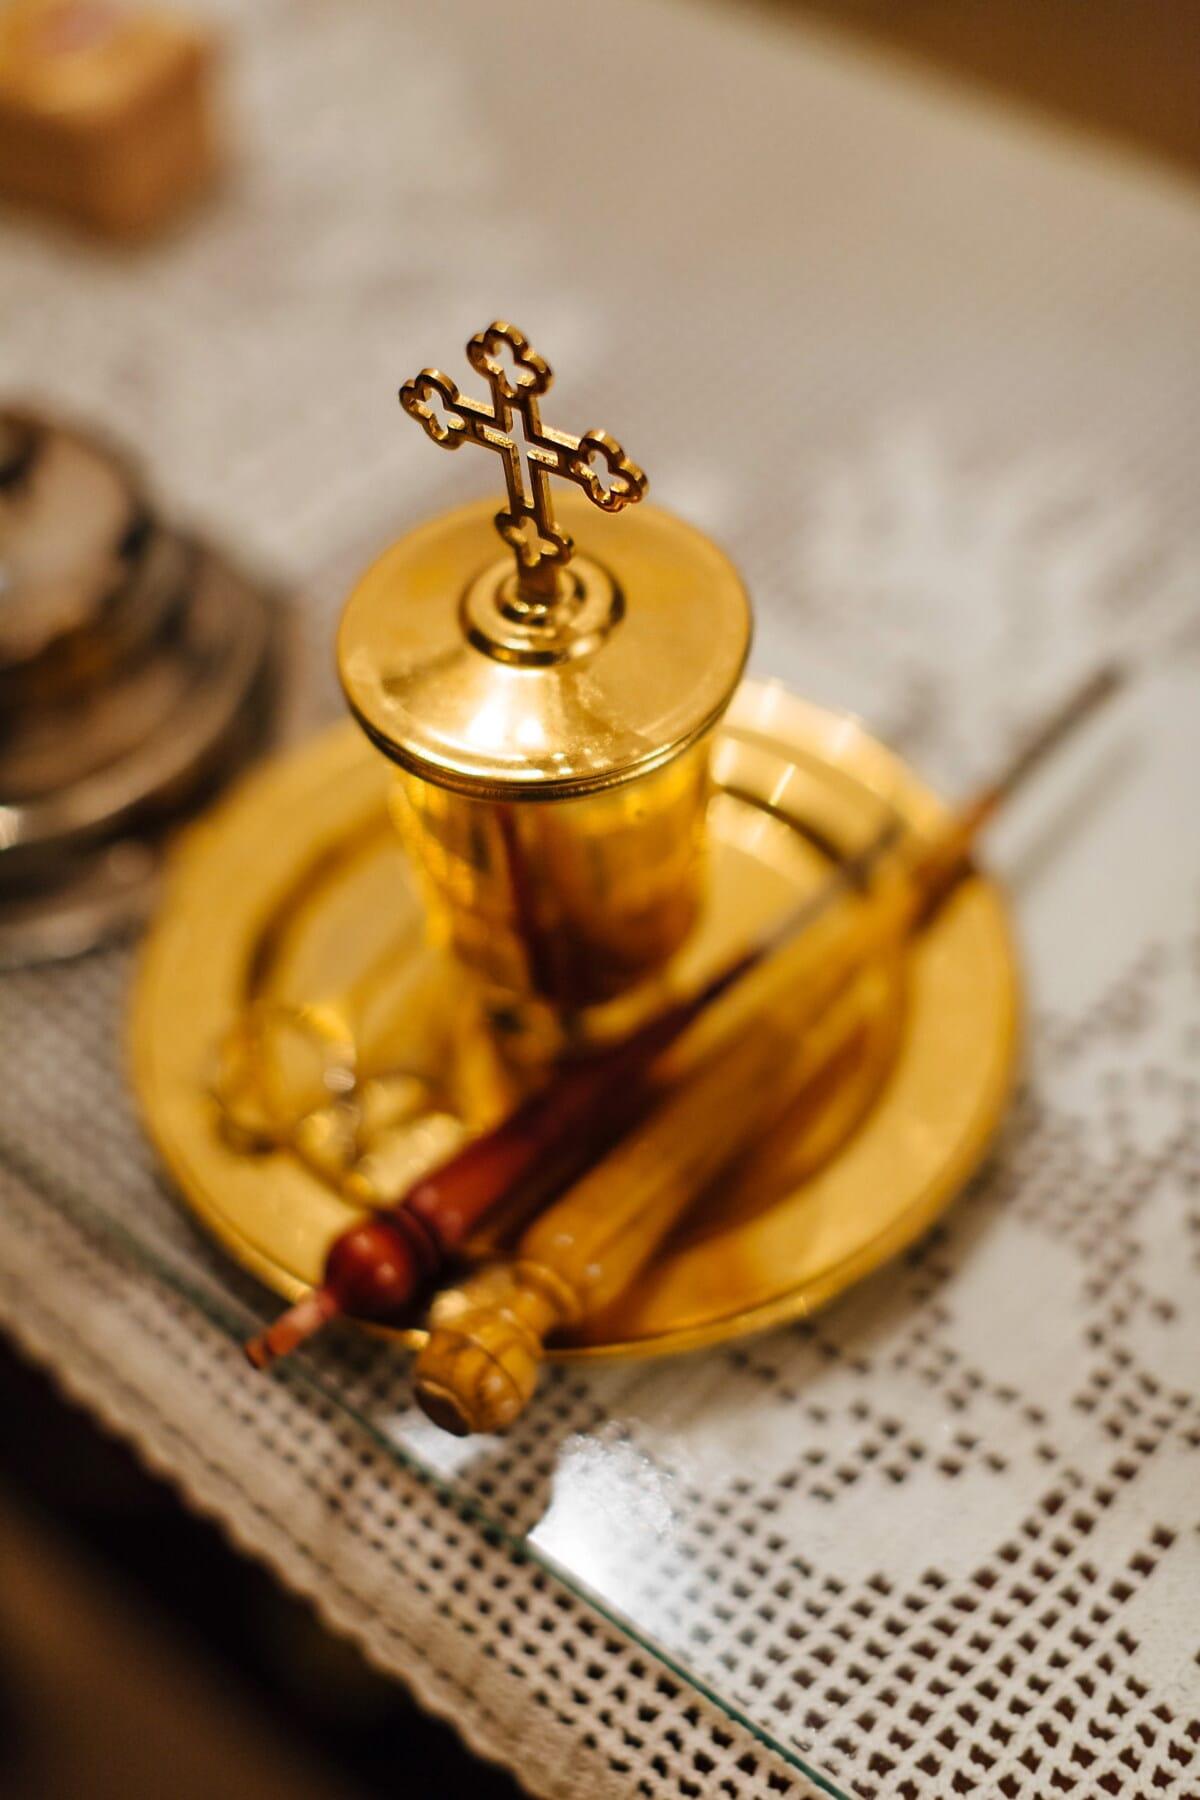 cross, christianity, orthodox, golden shine, tableware, still life, traditional, flatware, wood, food